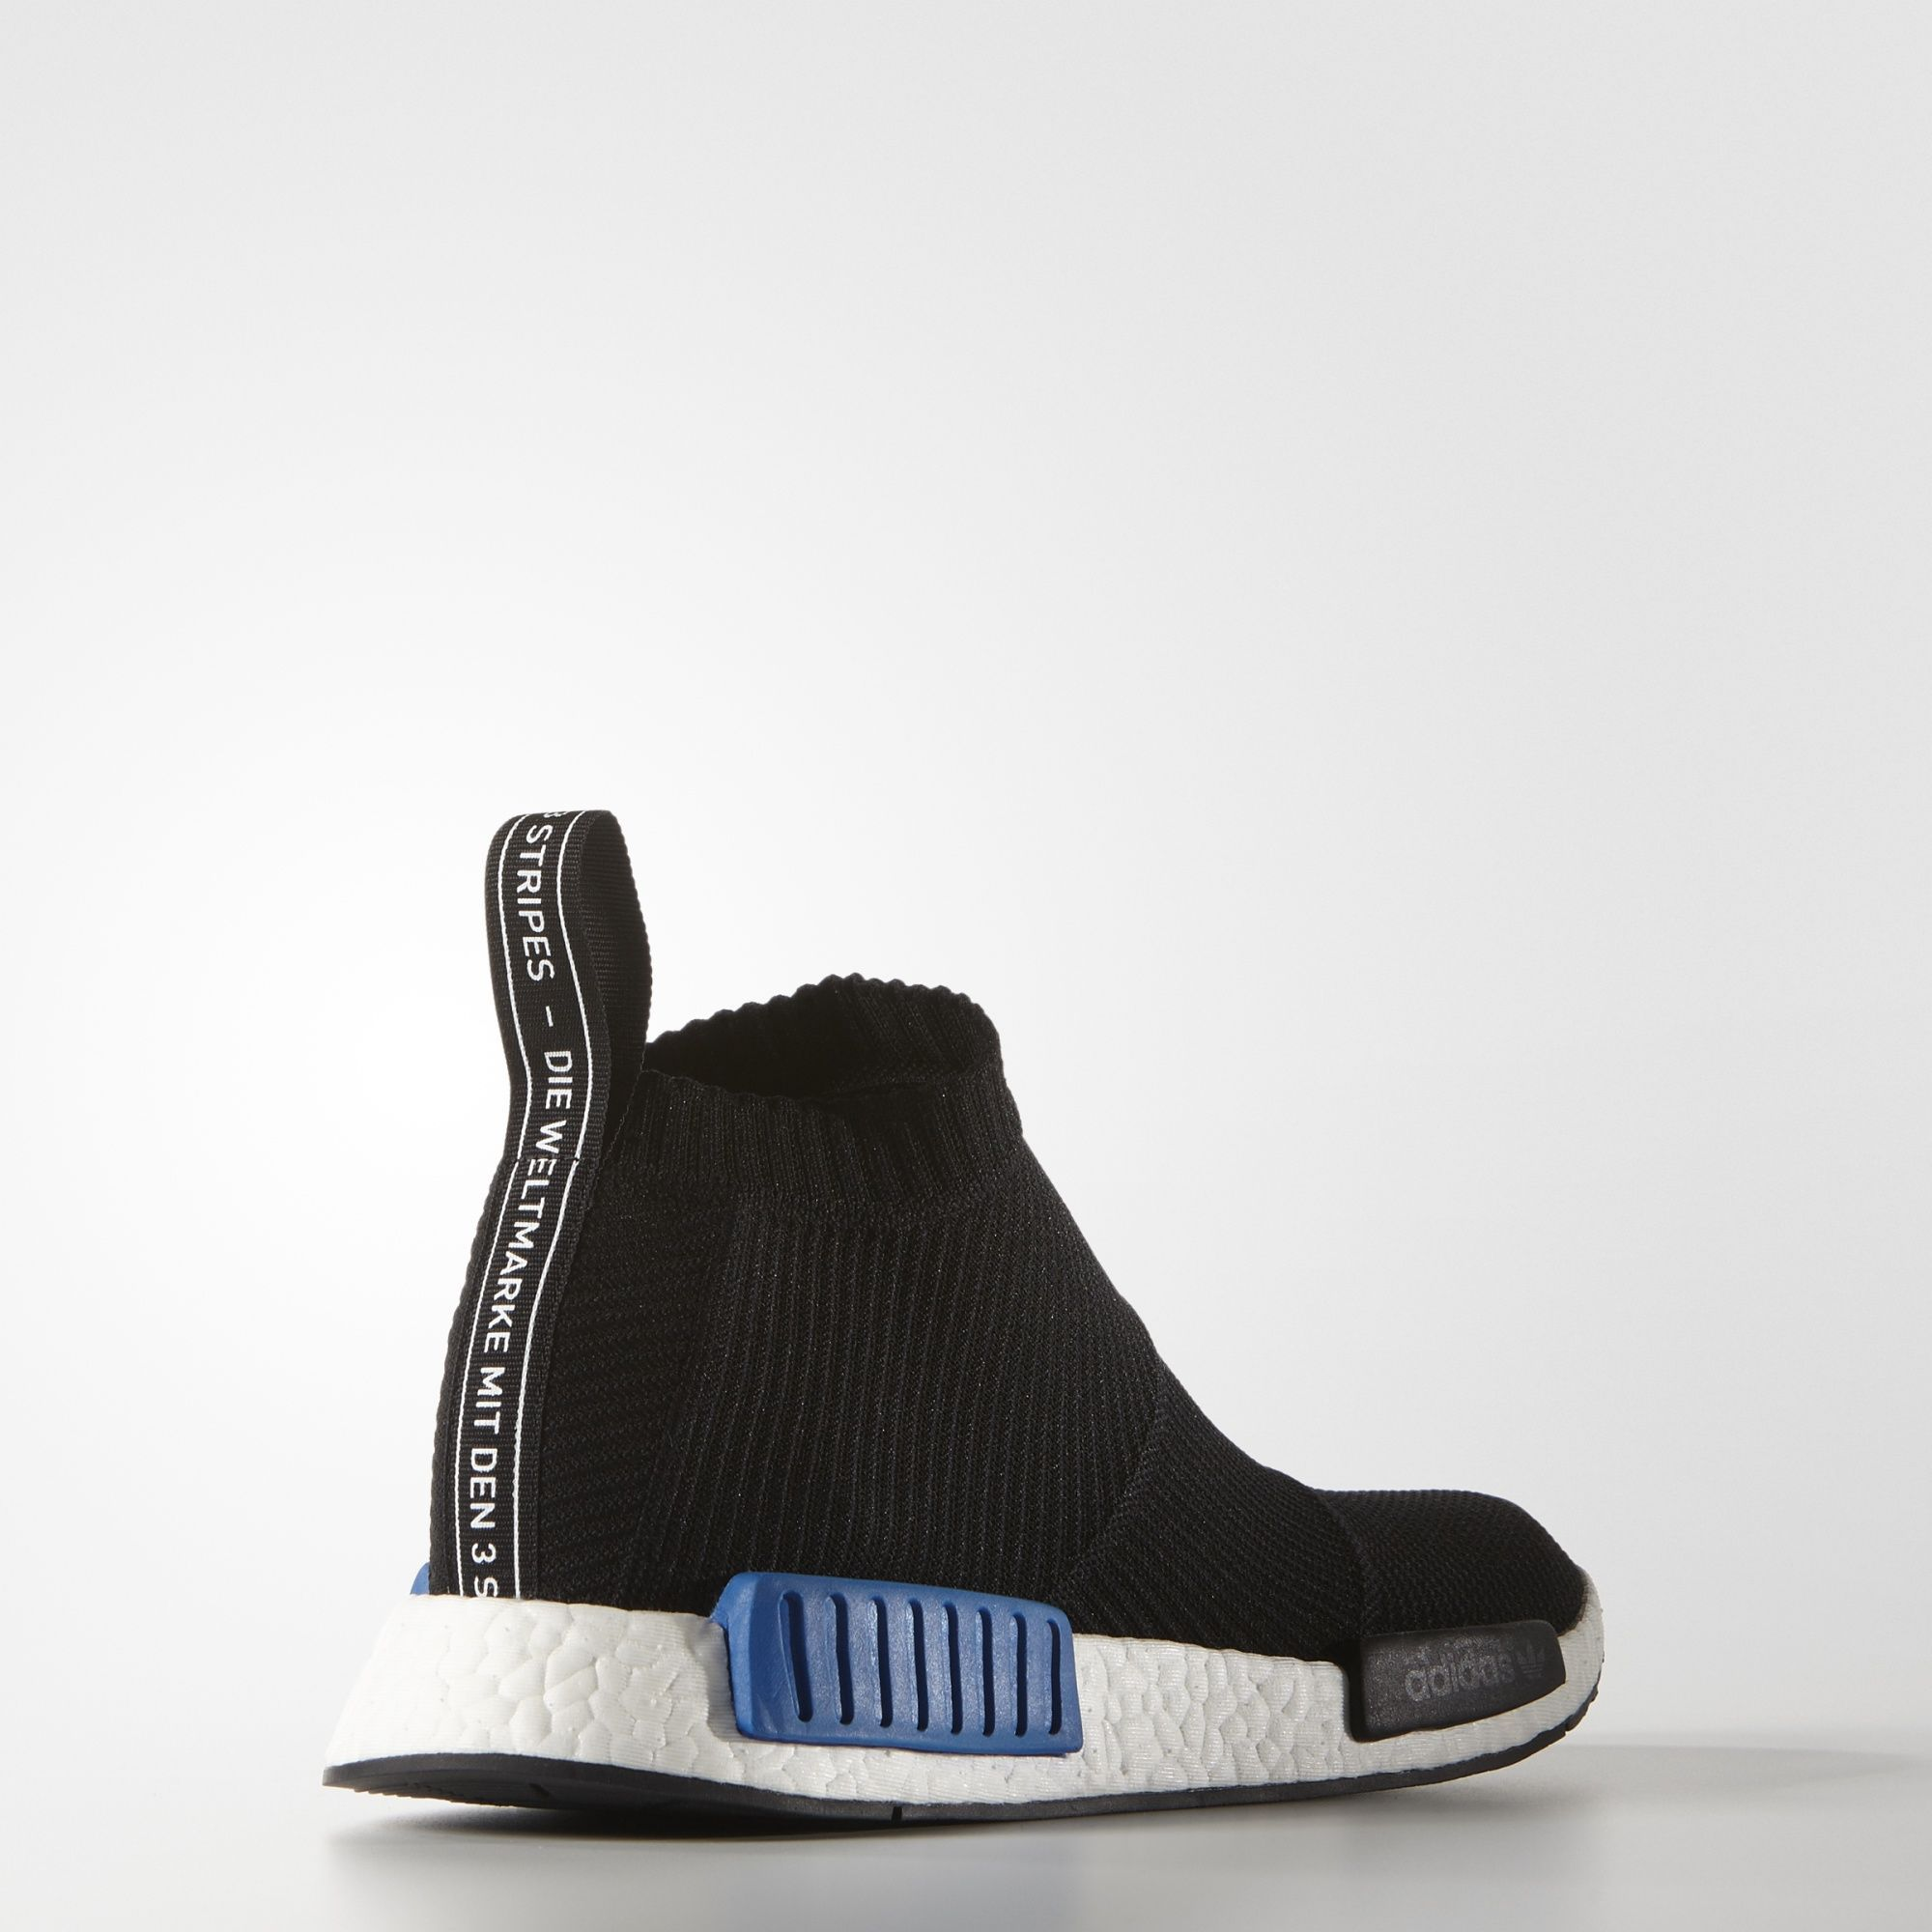 cee7f2cc1cb35 Adidas Nmd City Sock Pk